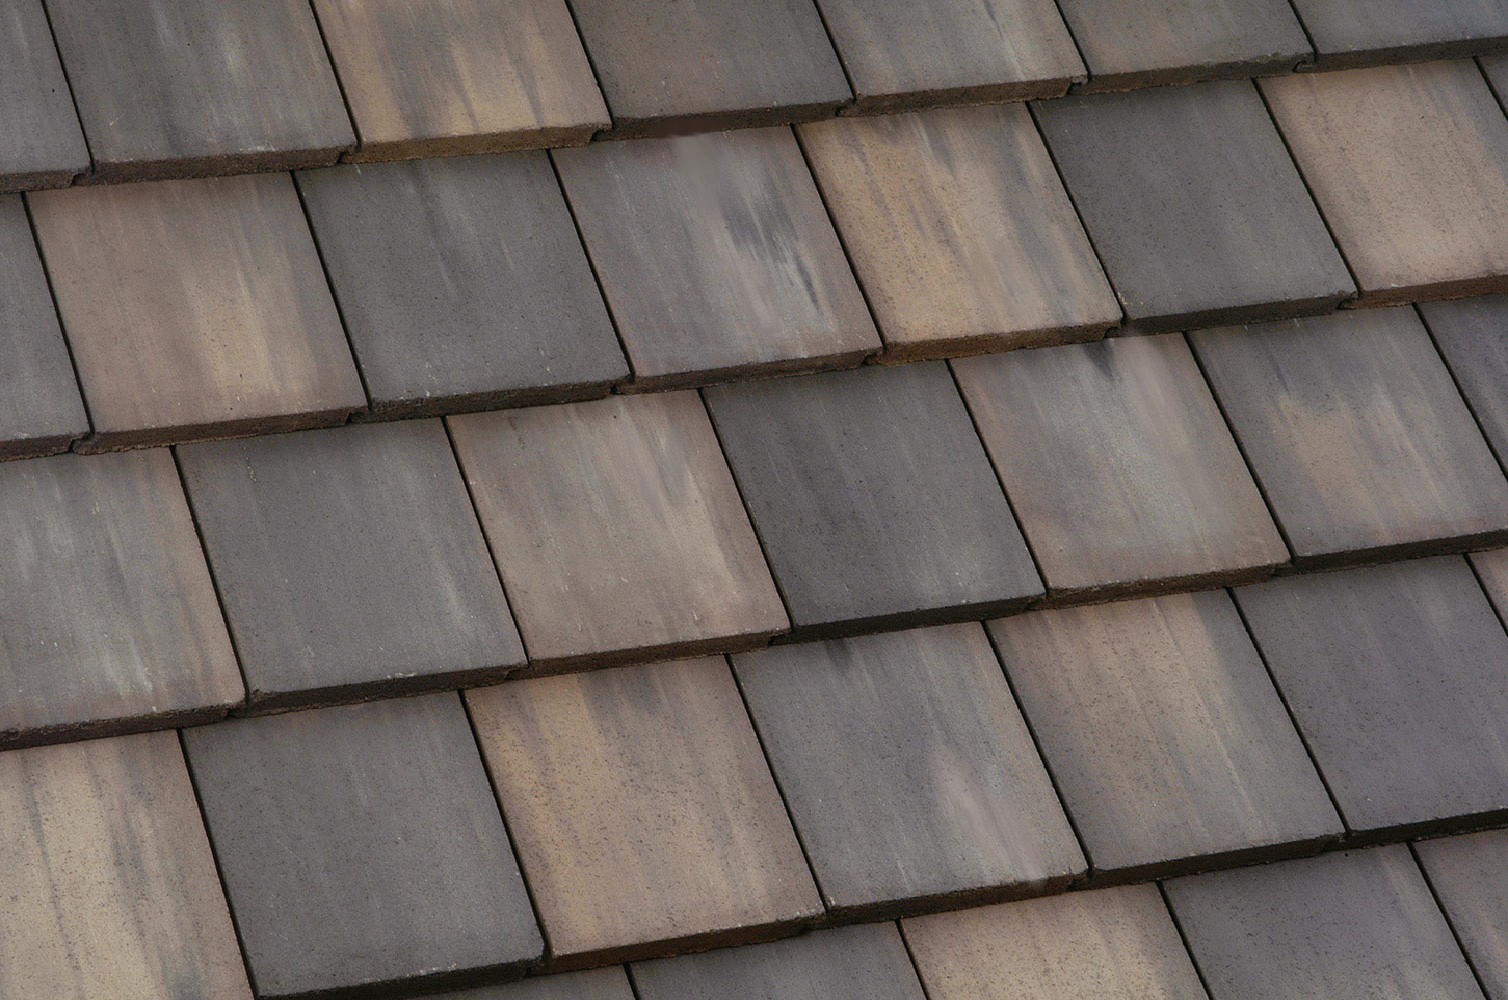 202 Bl Eagle Roofing